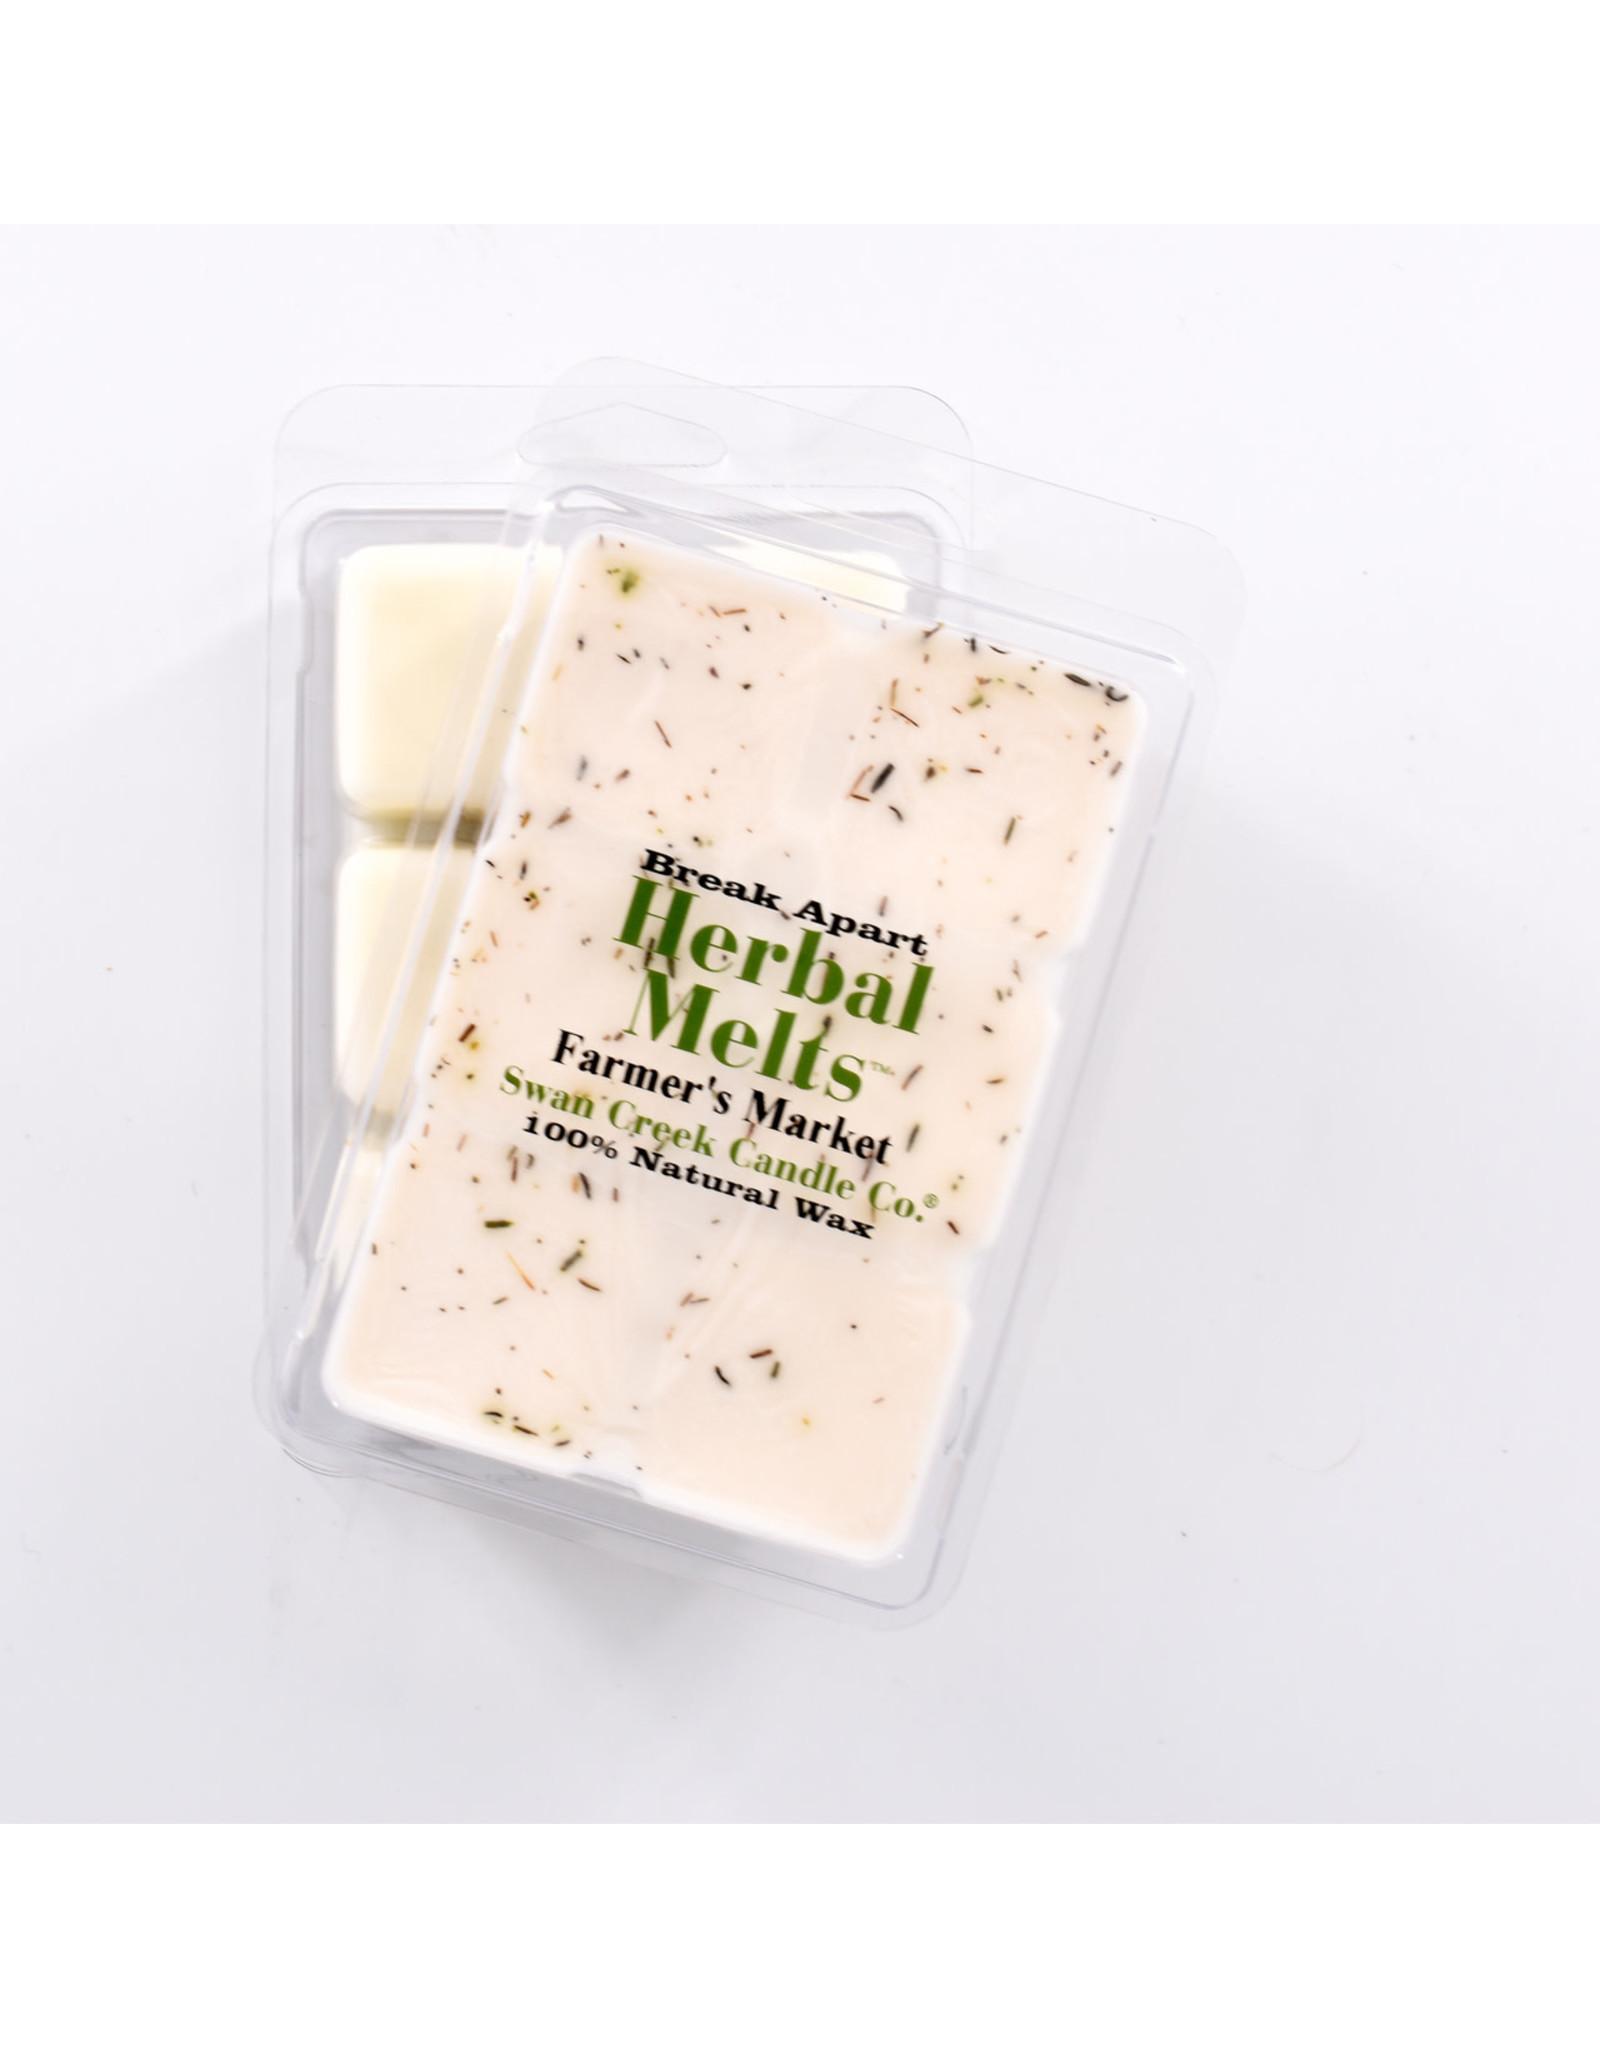 Swan Creek Wax Melts, Farmer's Market, 4.75 oz